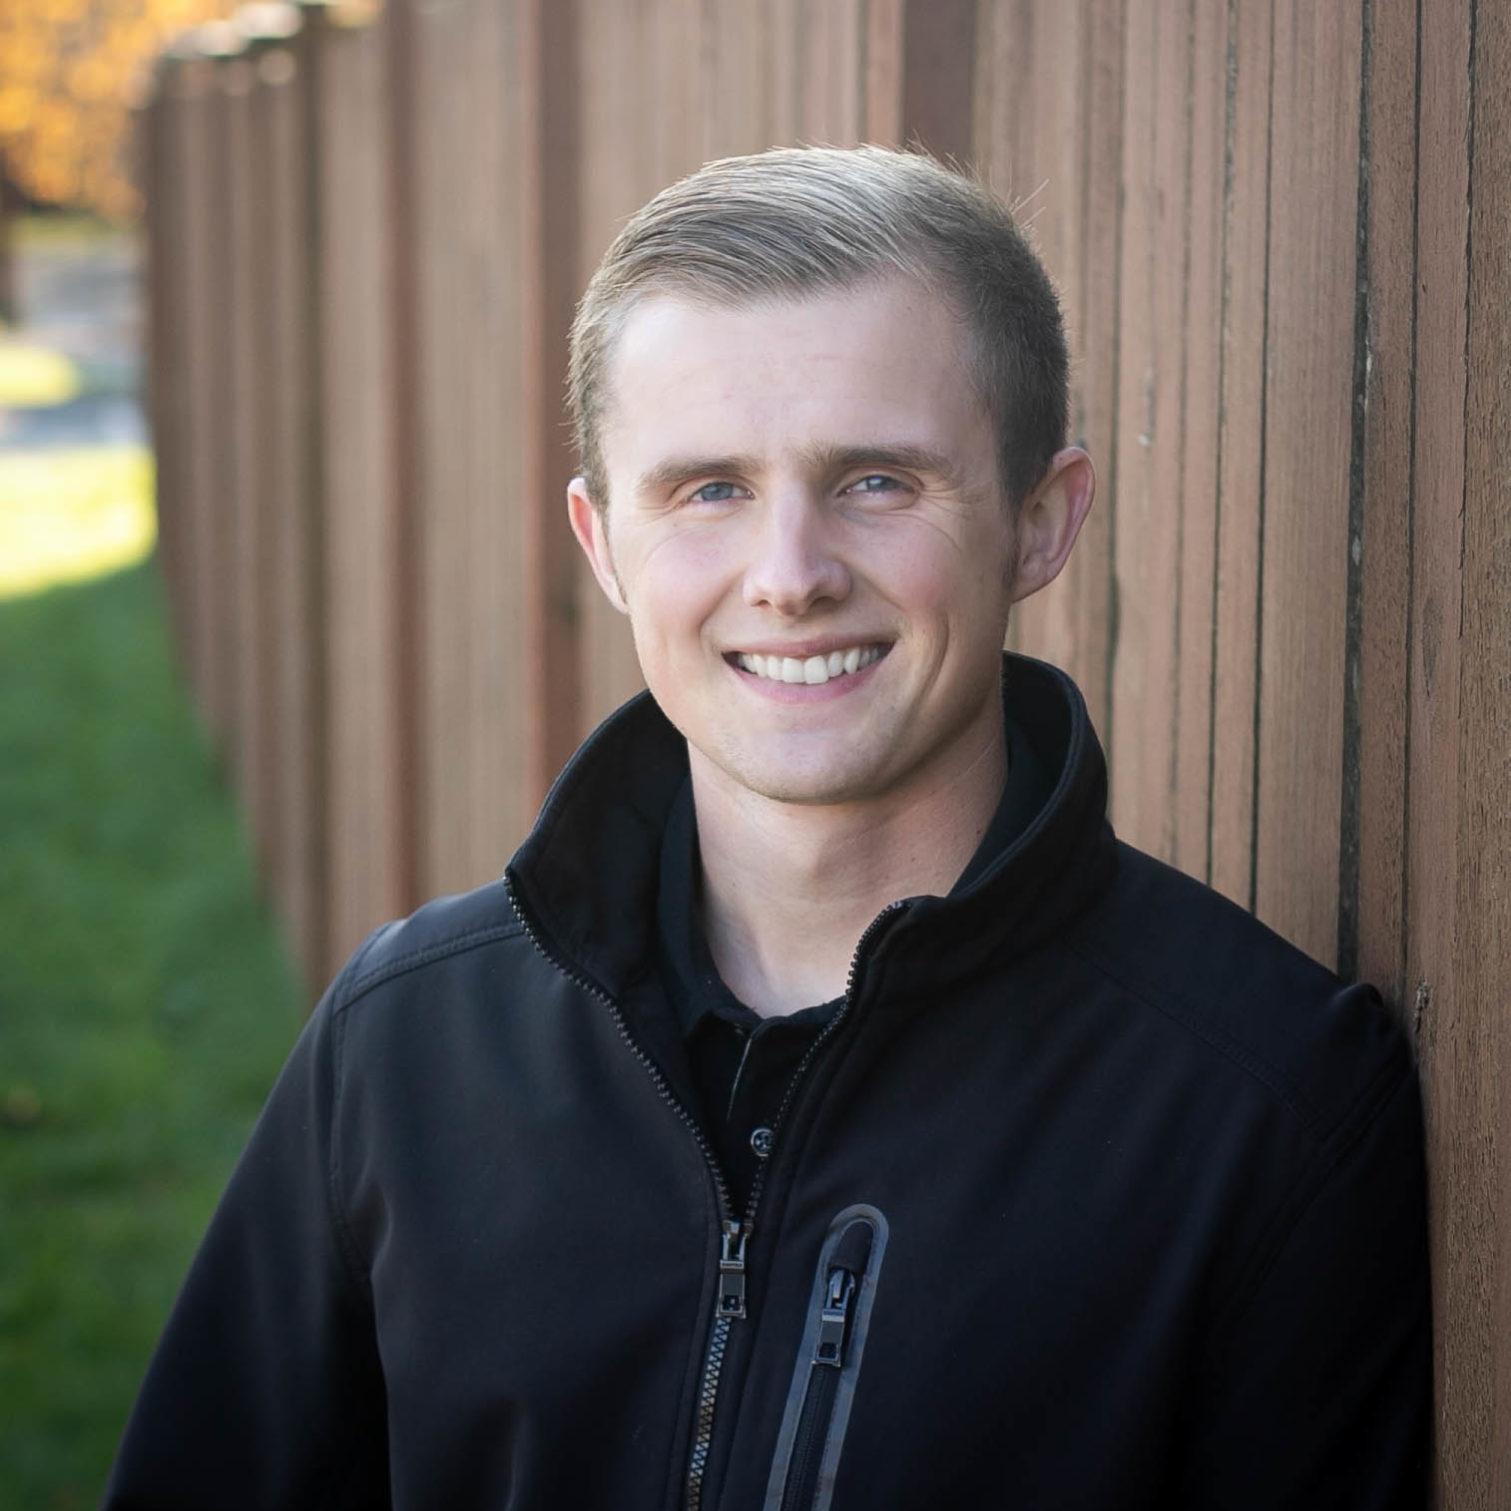 Jake Walker | Agent | PNW Insurance Group, LLC